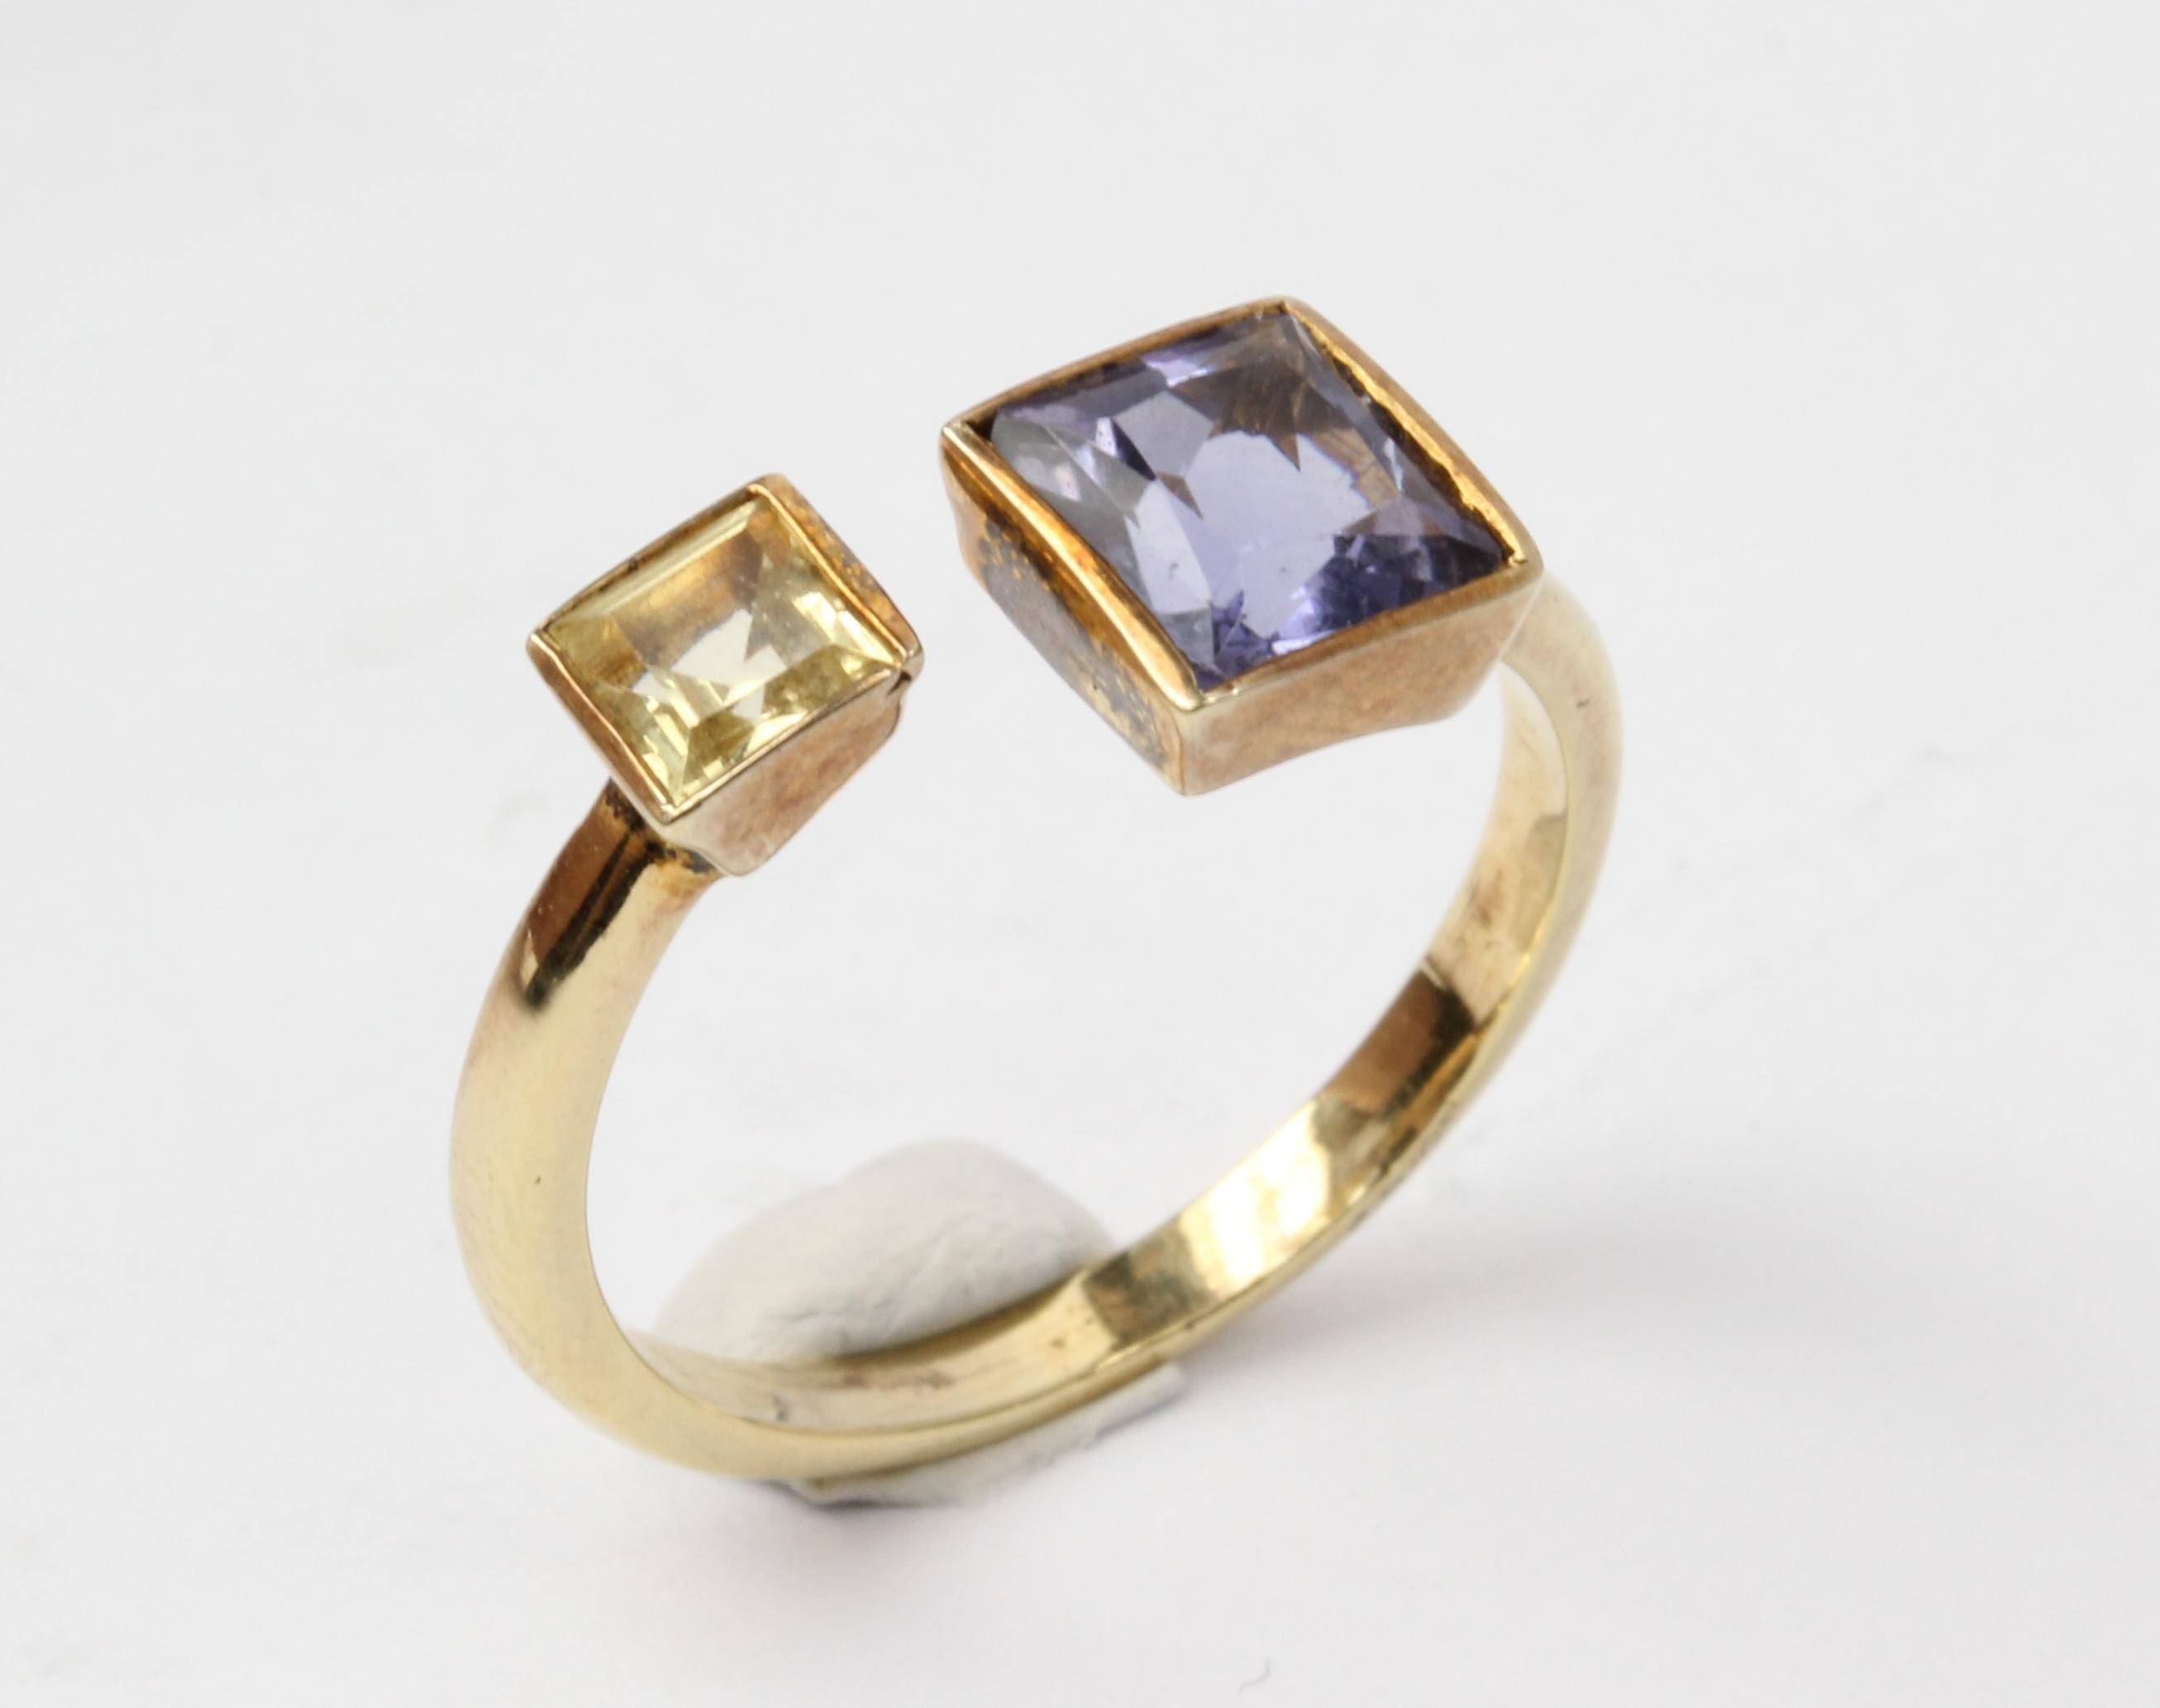 Silver ring_B&B_1637